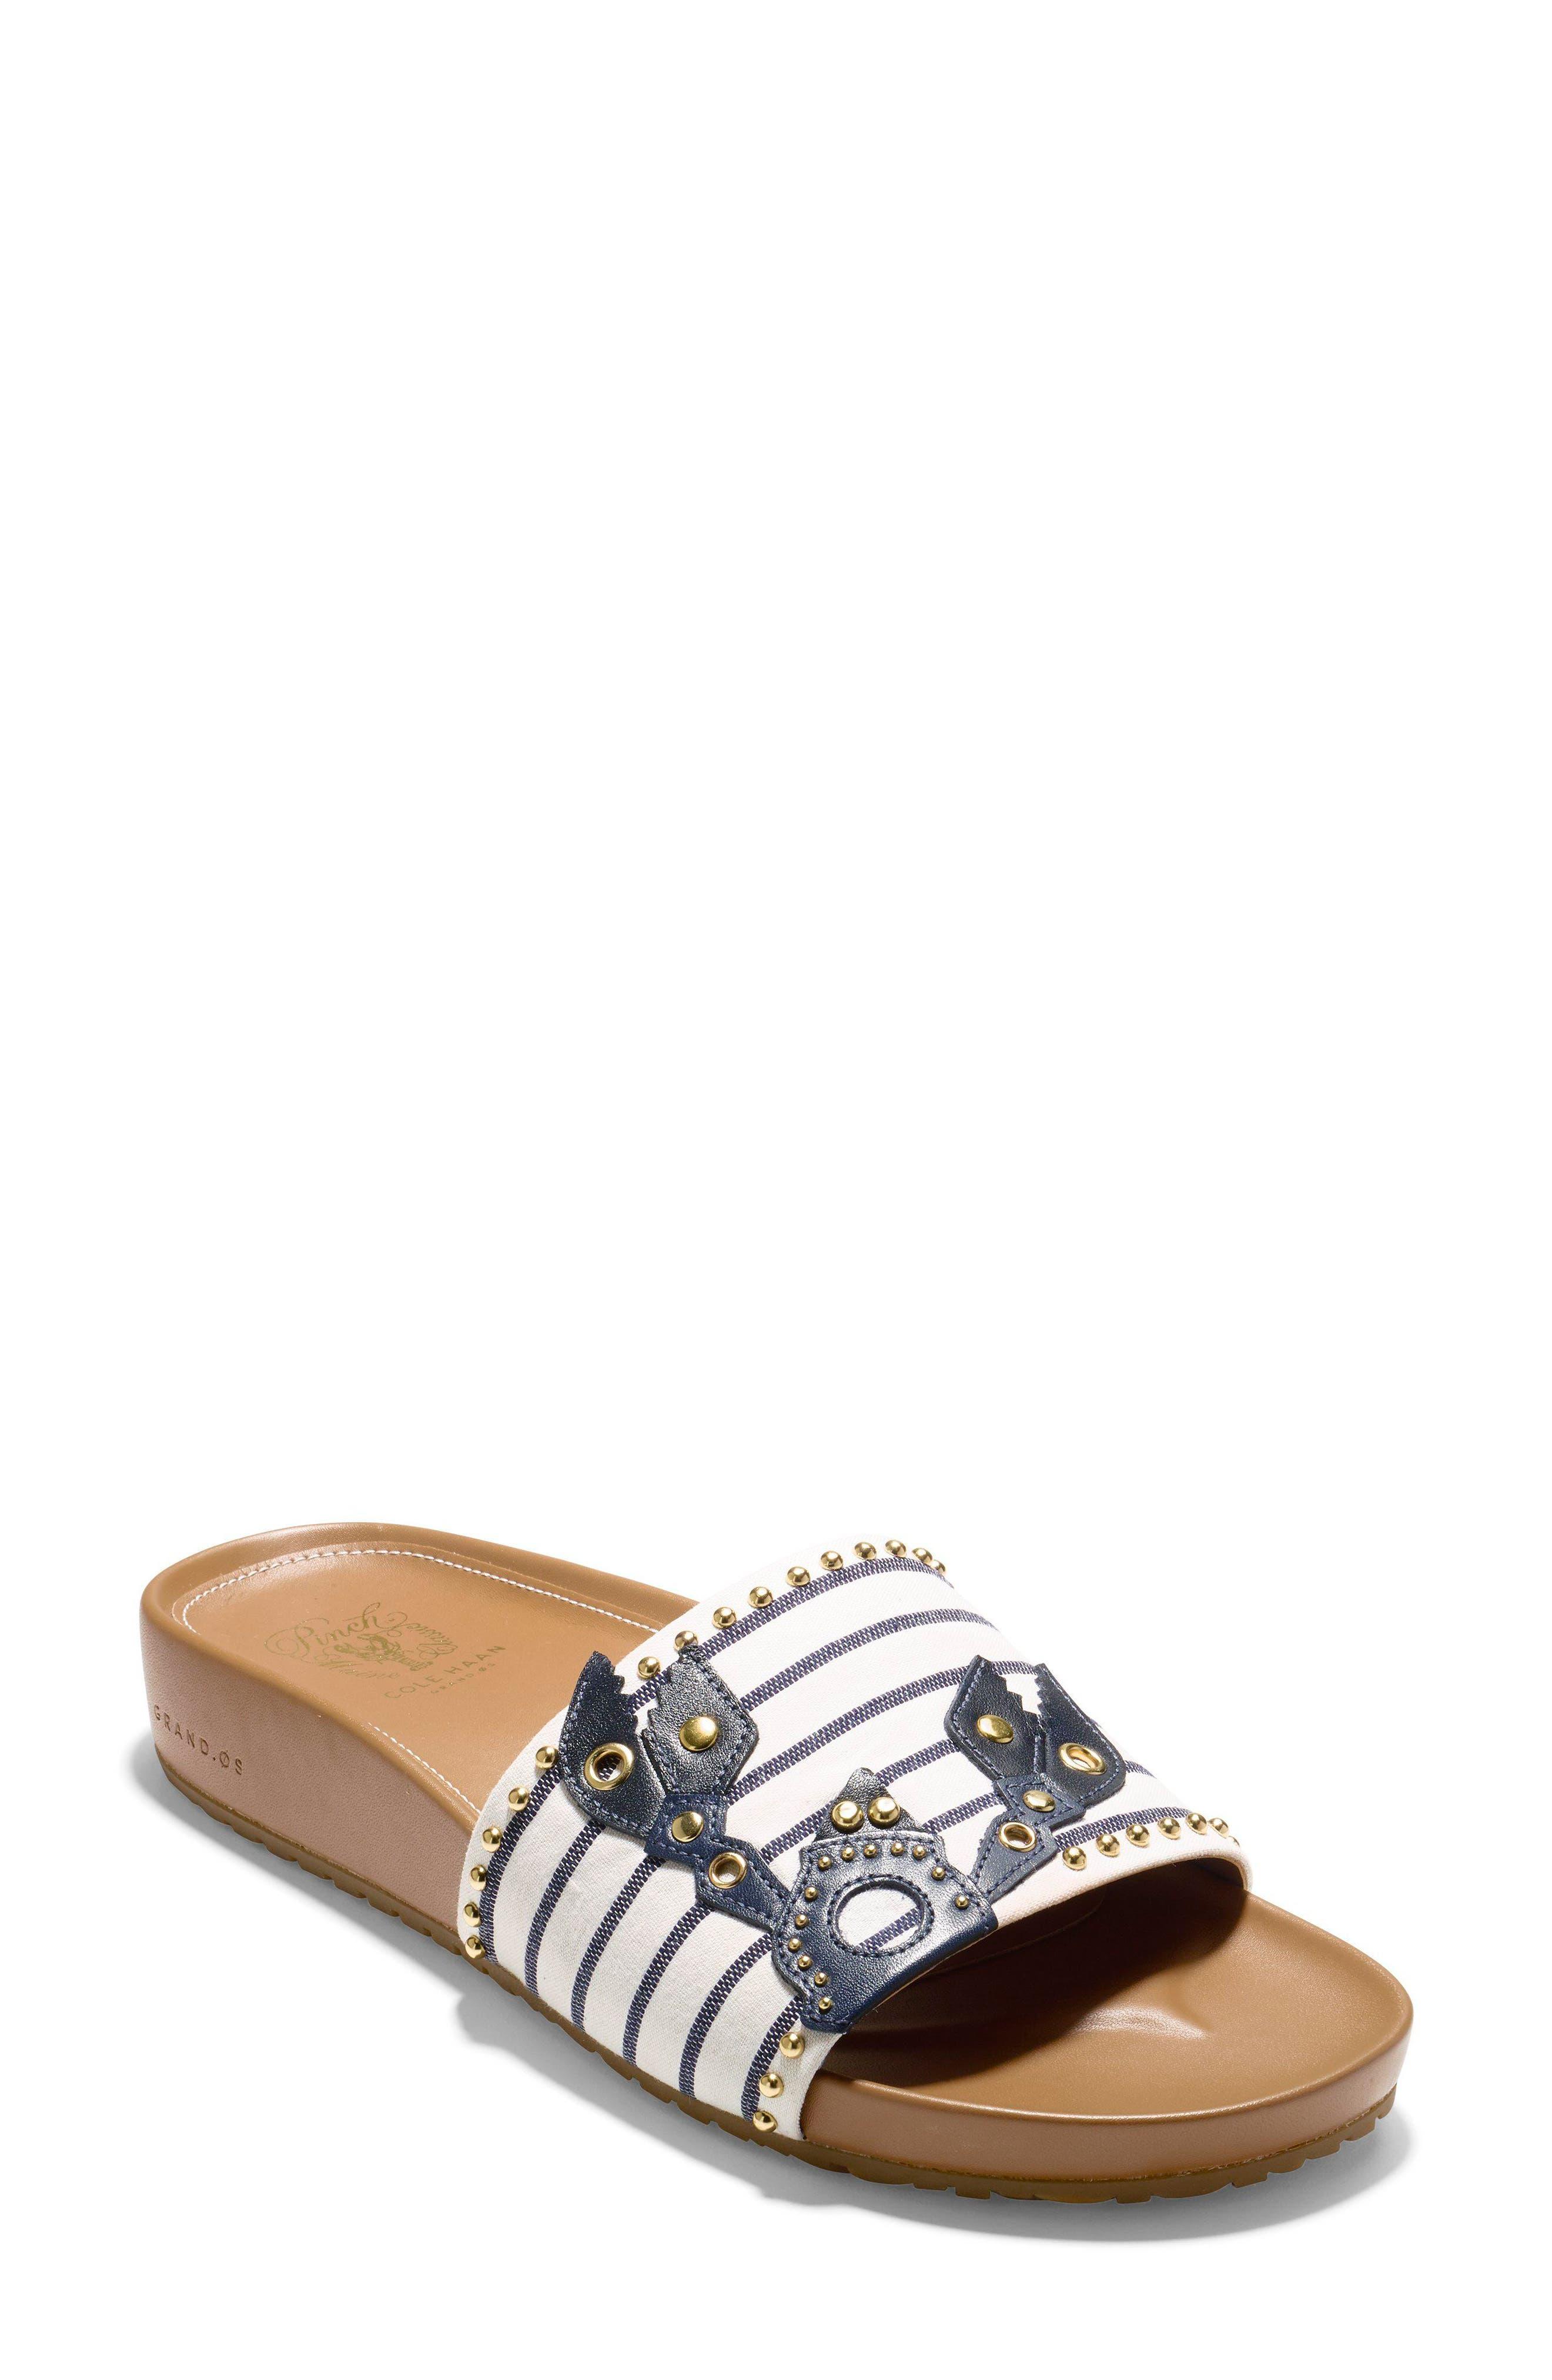 Pinch Montauk Lobster Slide Sandal,                         Main,                         color,